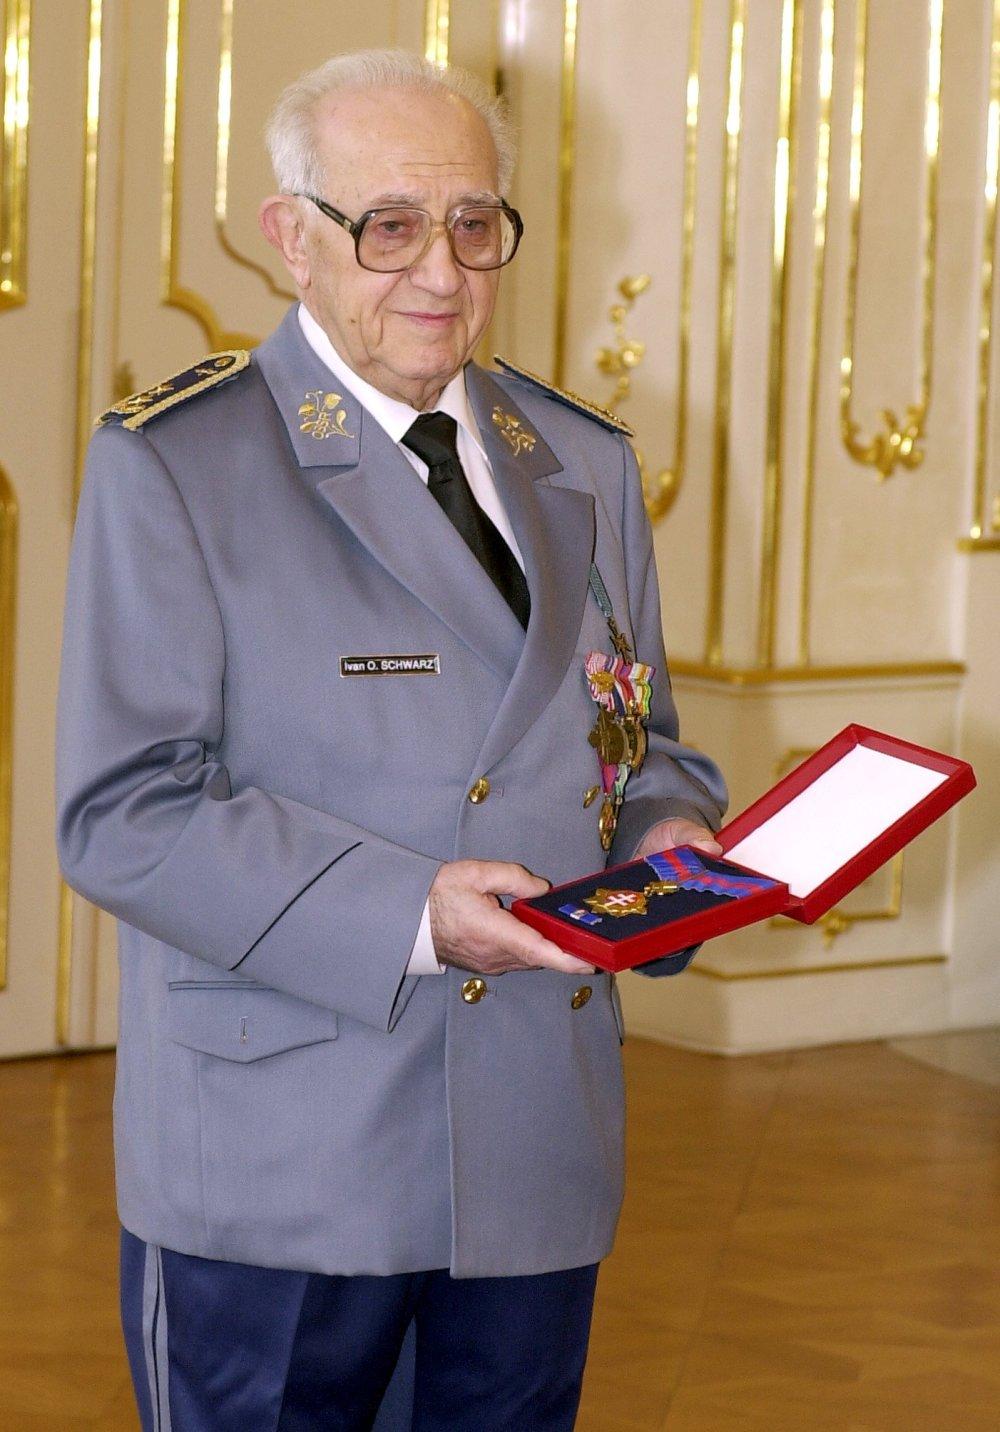 Pred desiatimi rokmi dostal Ivan Schwarz vyznamenanie Rad Bieleho dvojkríža III. triedy. Foto - TASR